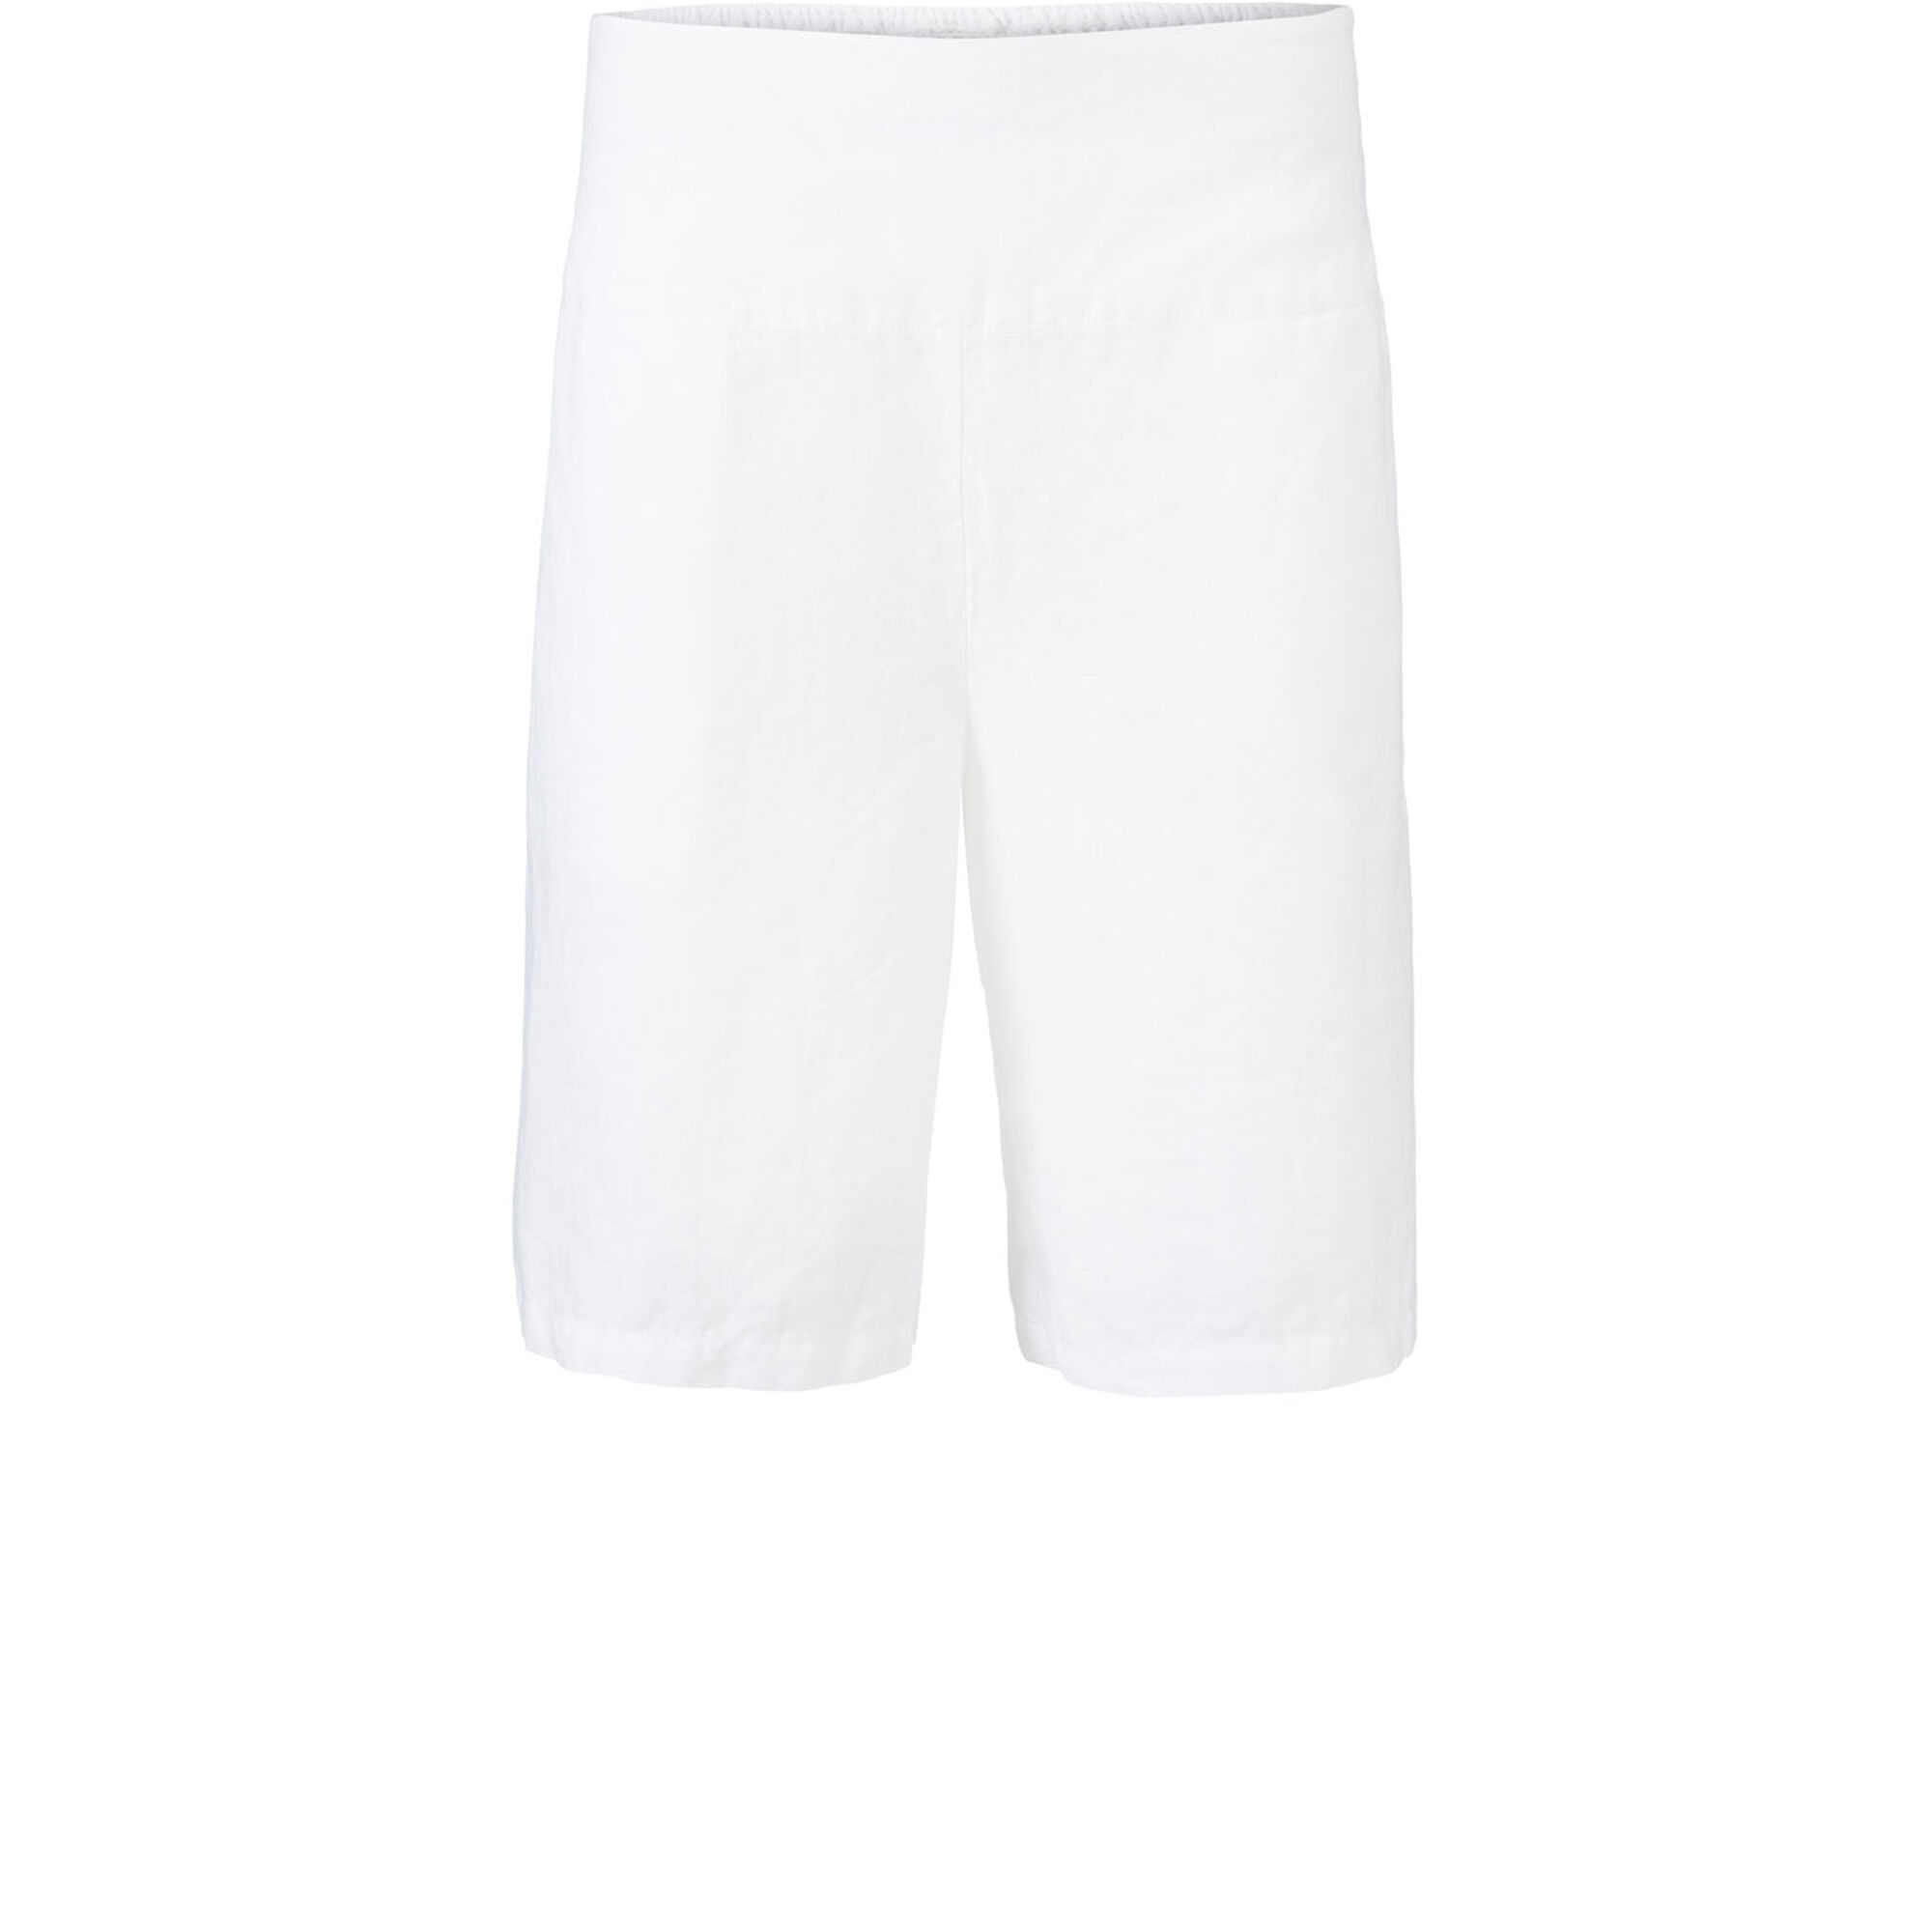 PINJA SHORTS, White, hi-res